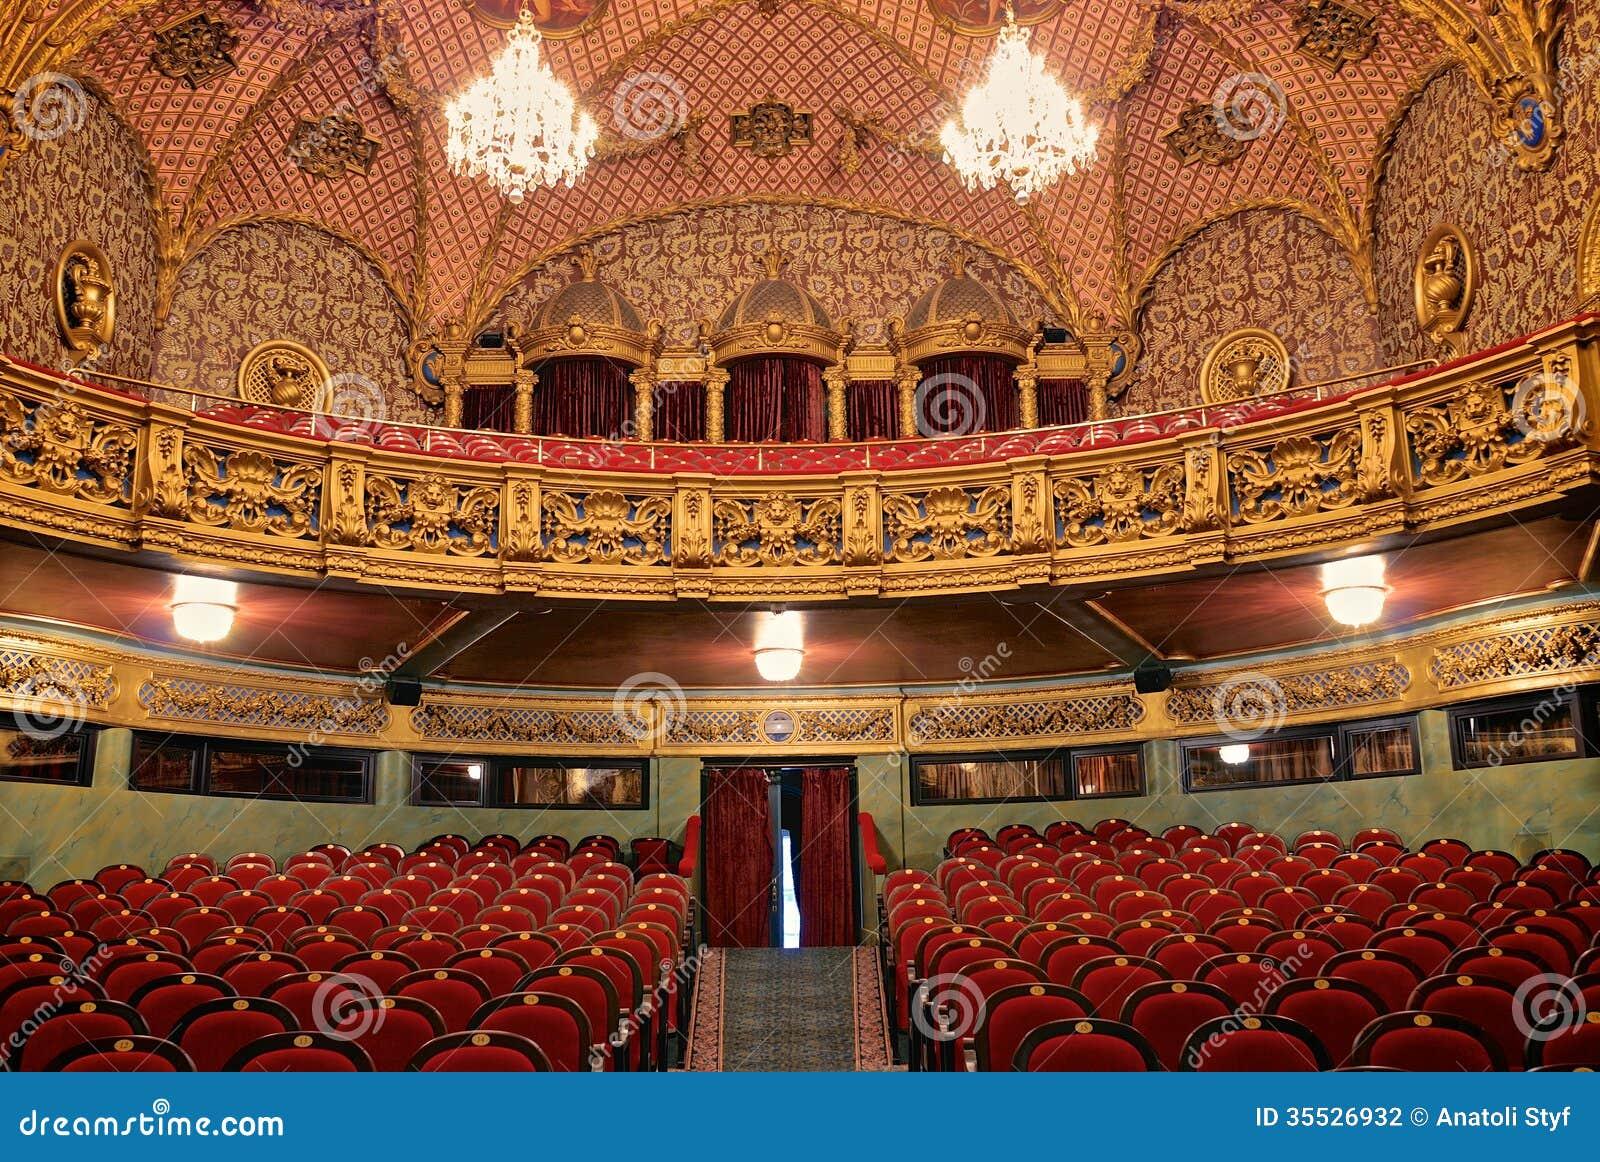 Wnętrze theatre